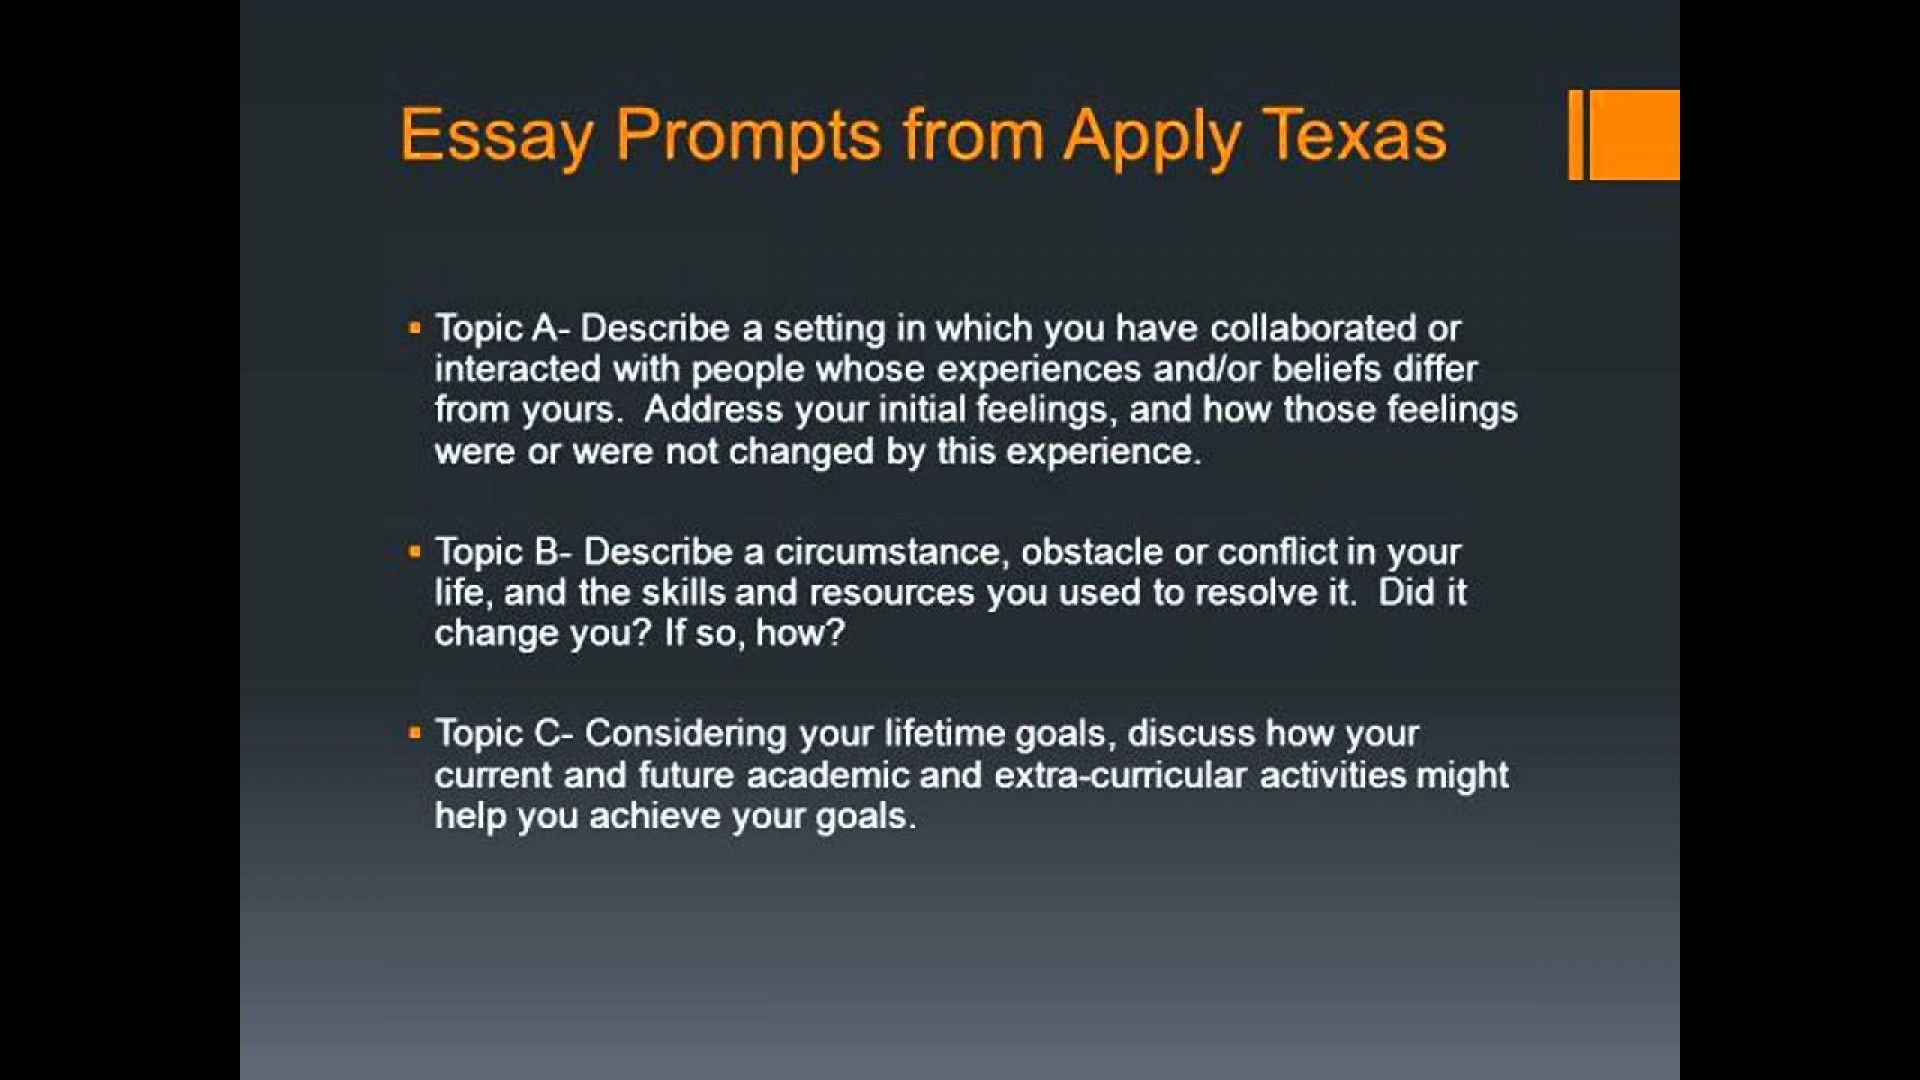 010 Apply Texas Essays Maxresdefault Dreaded Essay B Examples A 2017 C Prompts 1920